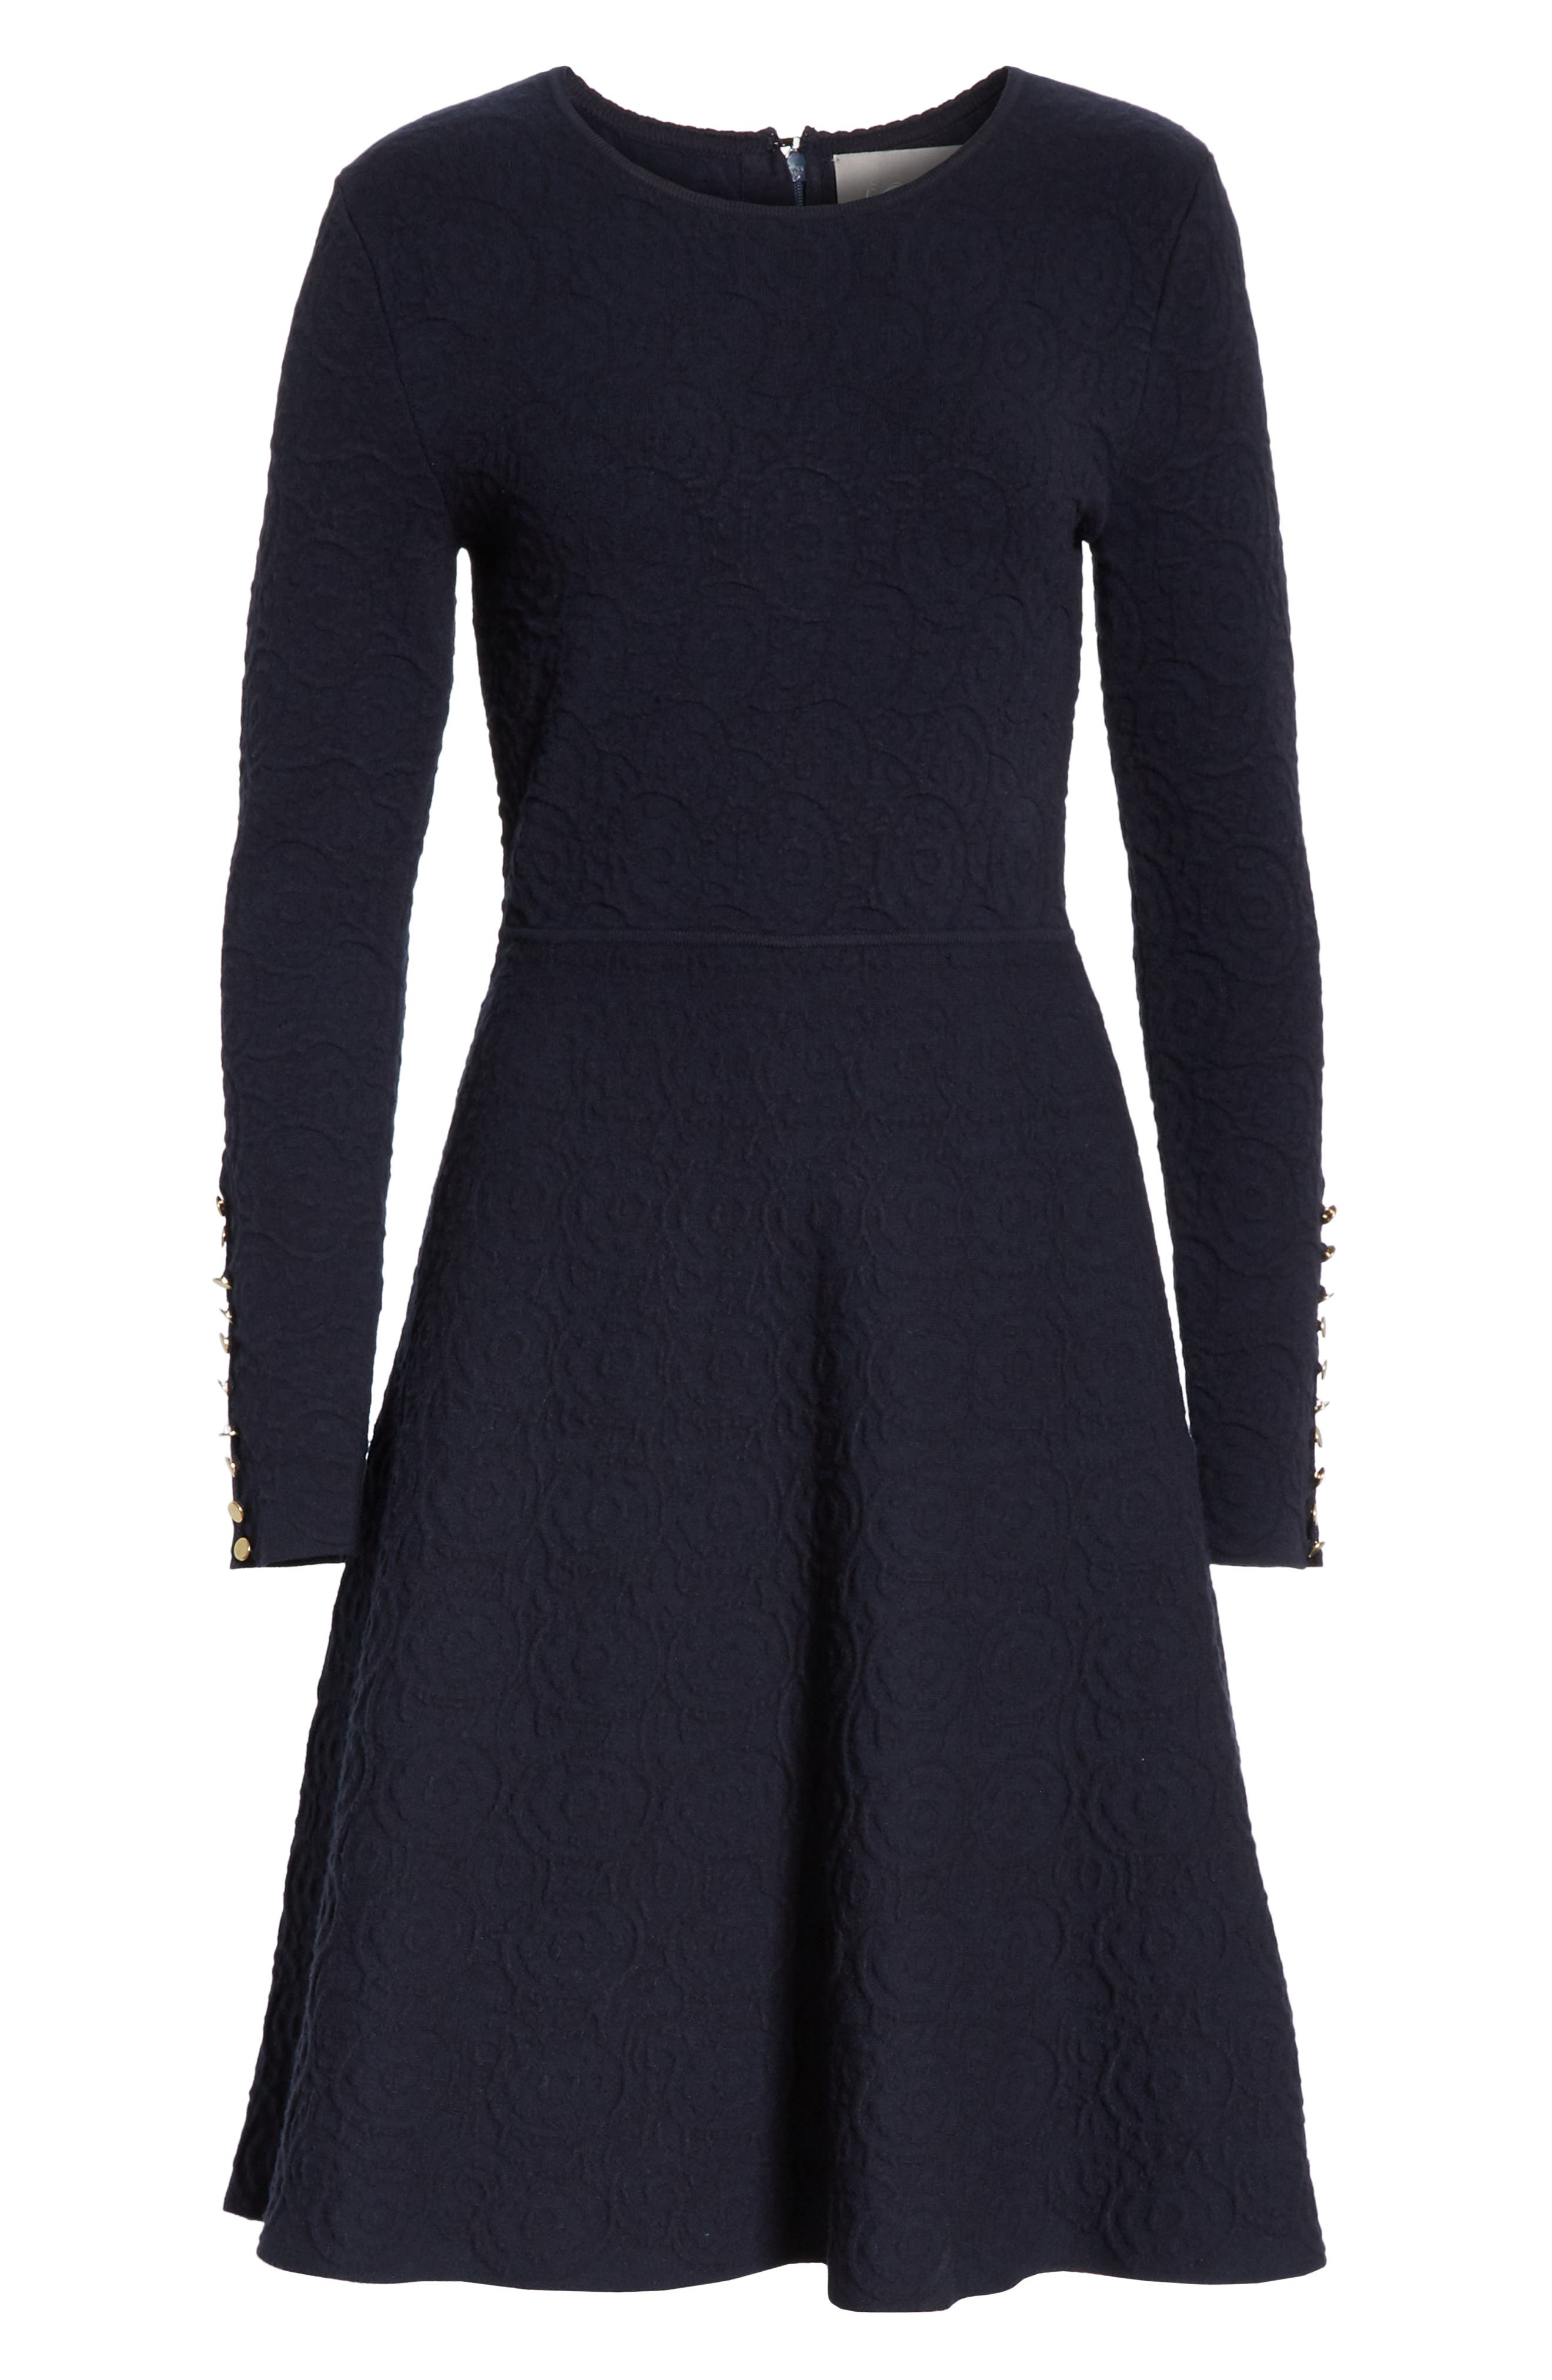 Textured Jacquard Knit Fit & Flare Dress,                             Alternate thumbnail 7, color,                             NAVY